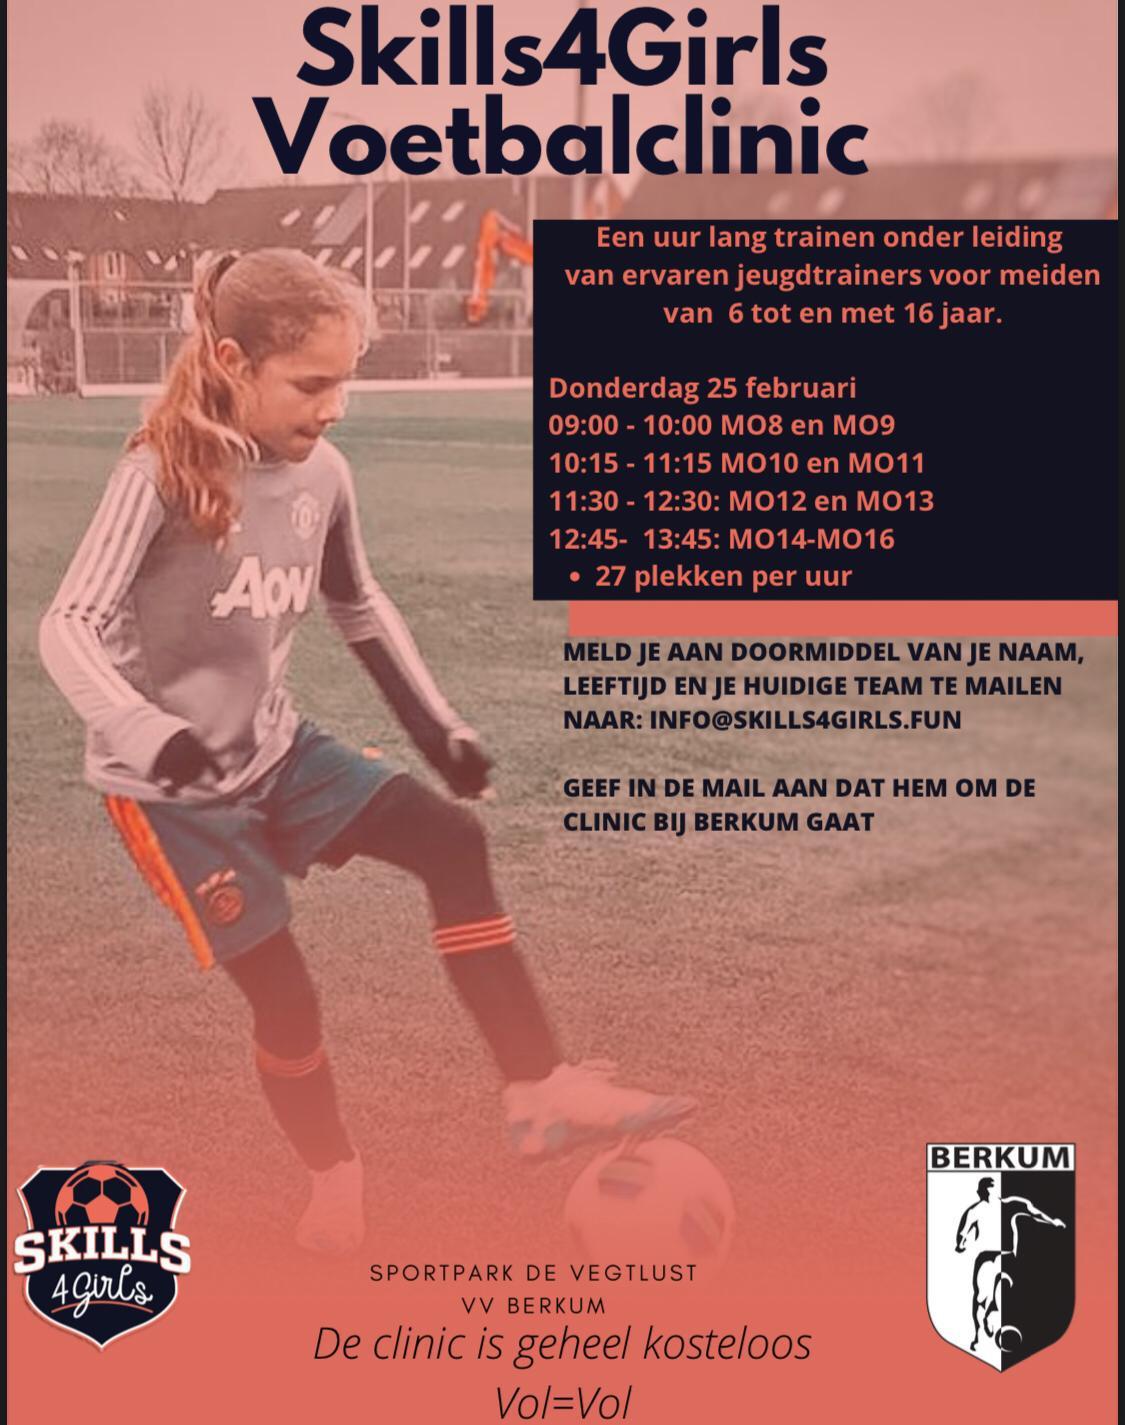 Skills4Girls voetbalclinic